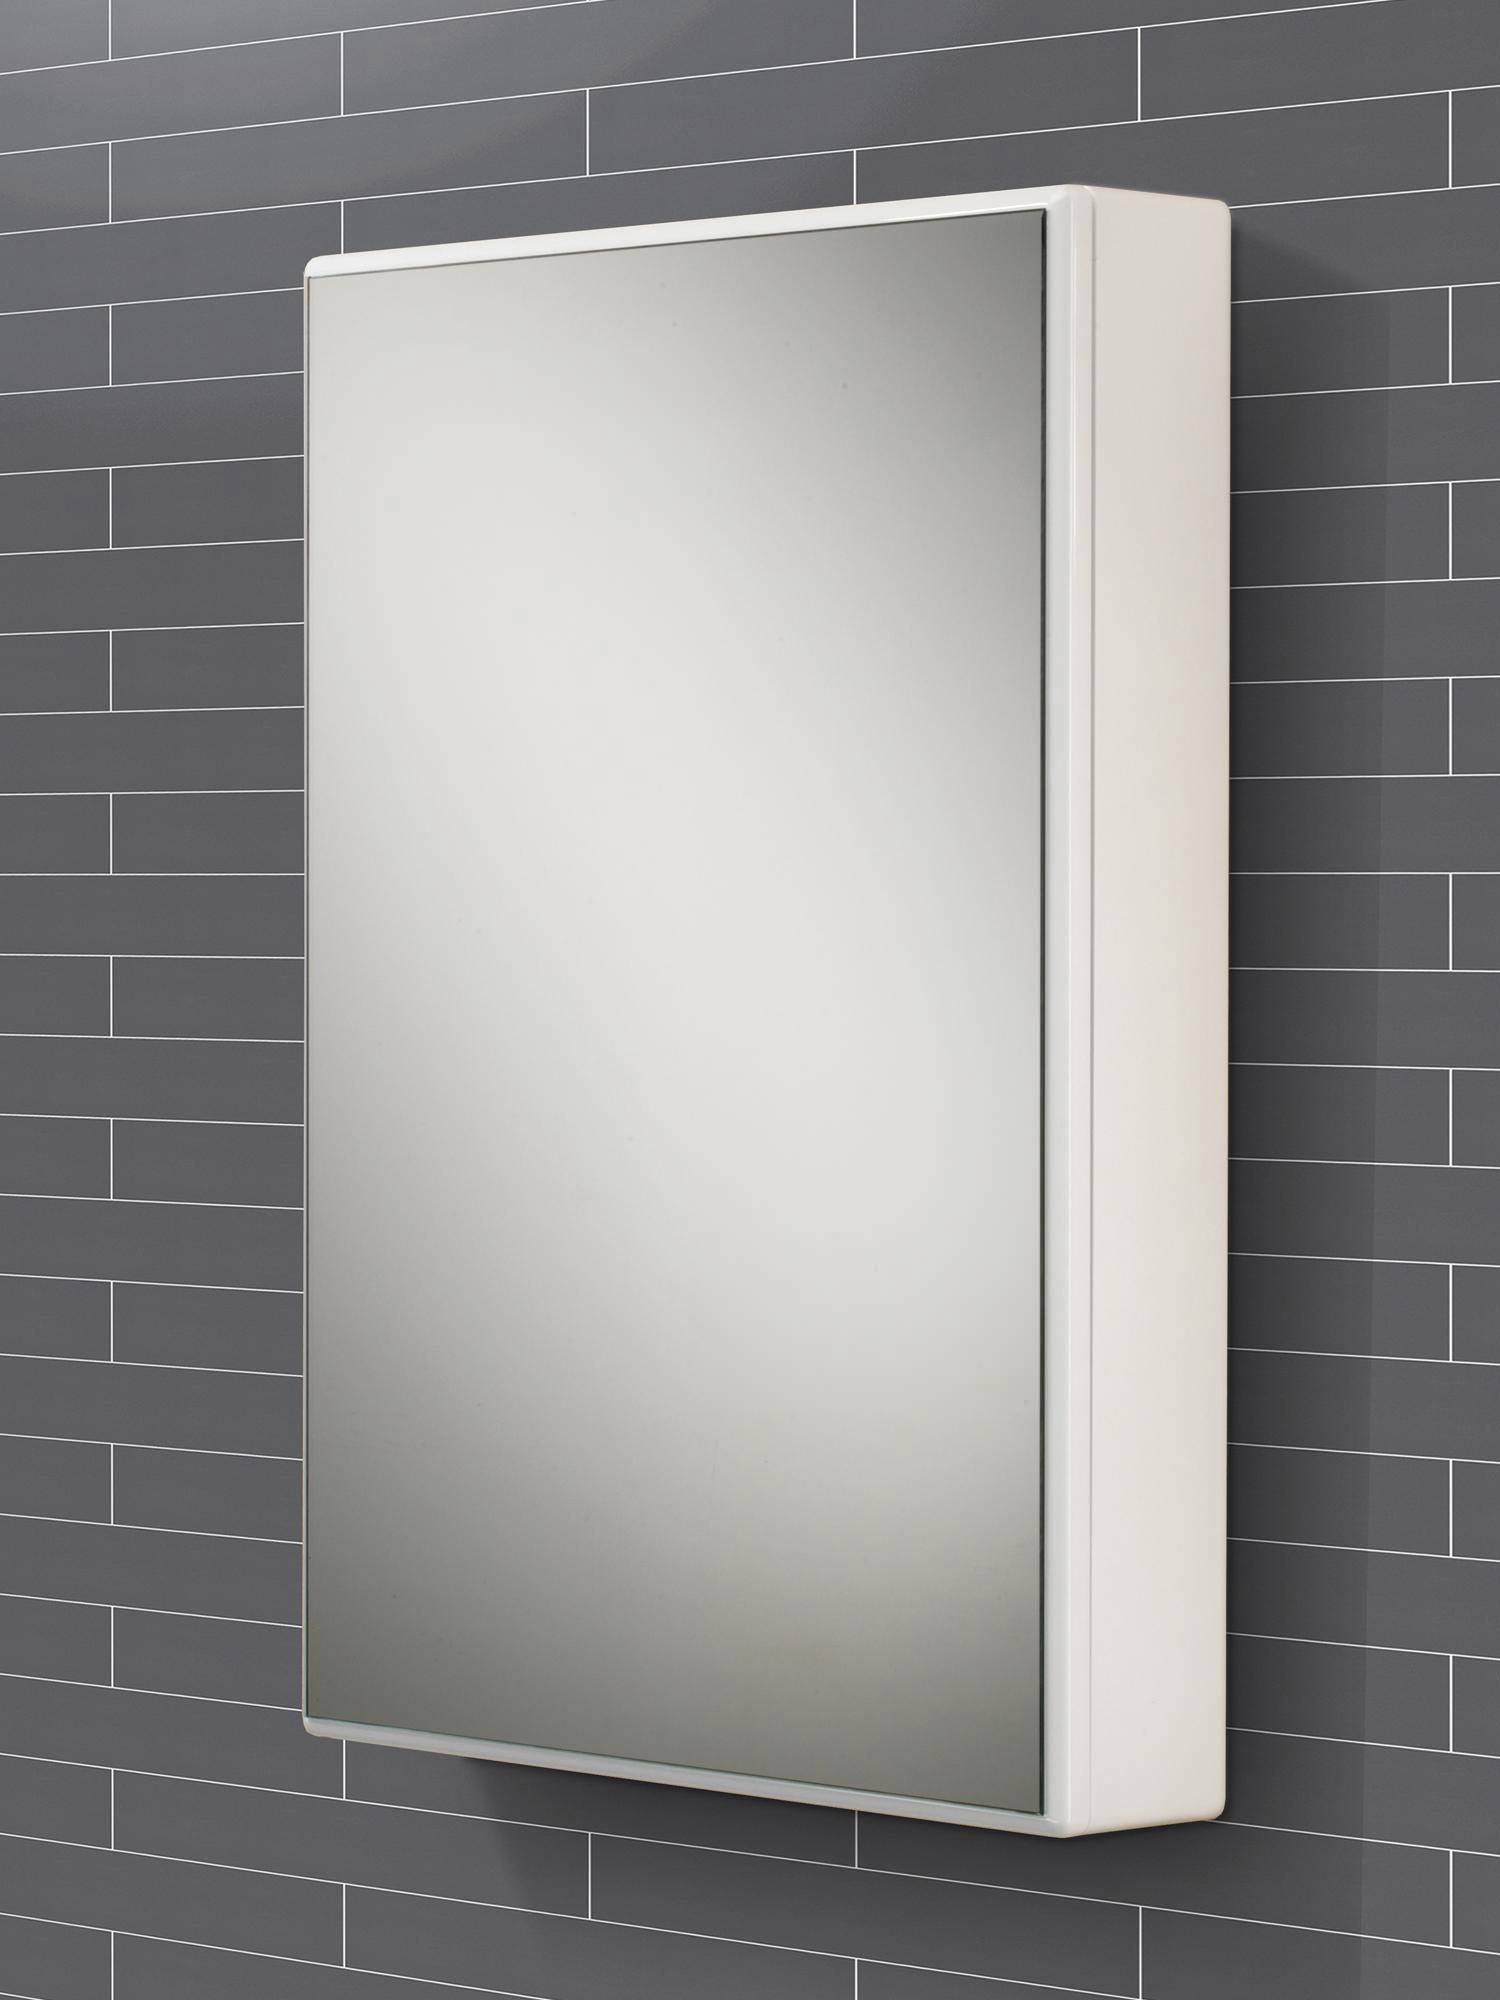 HIB Tulsa Slimline Single Door Mirrored Cabinet 500 X